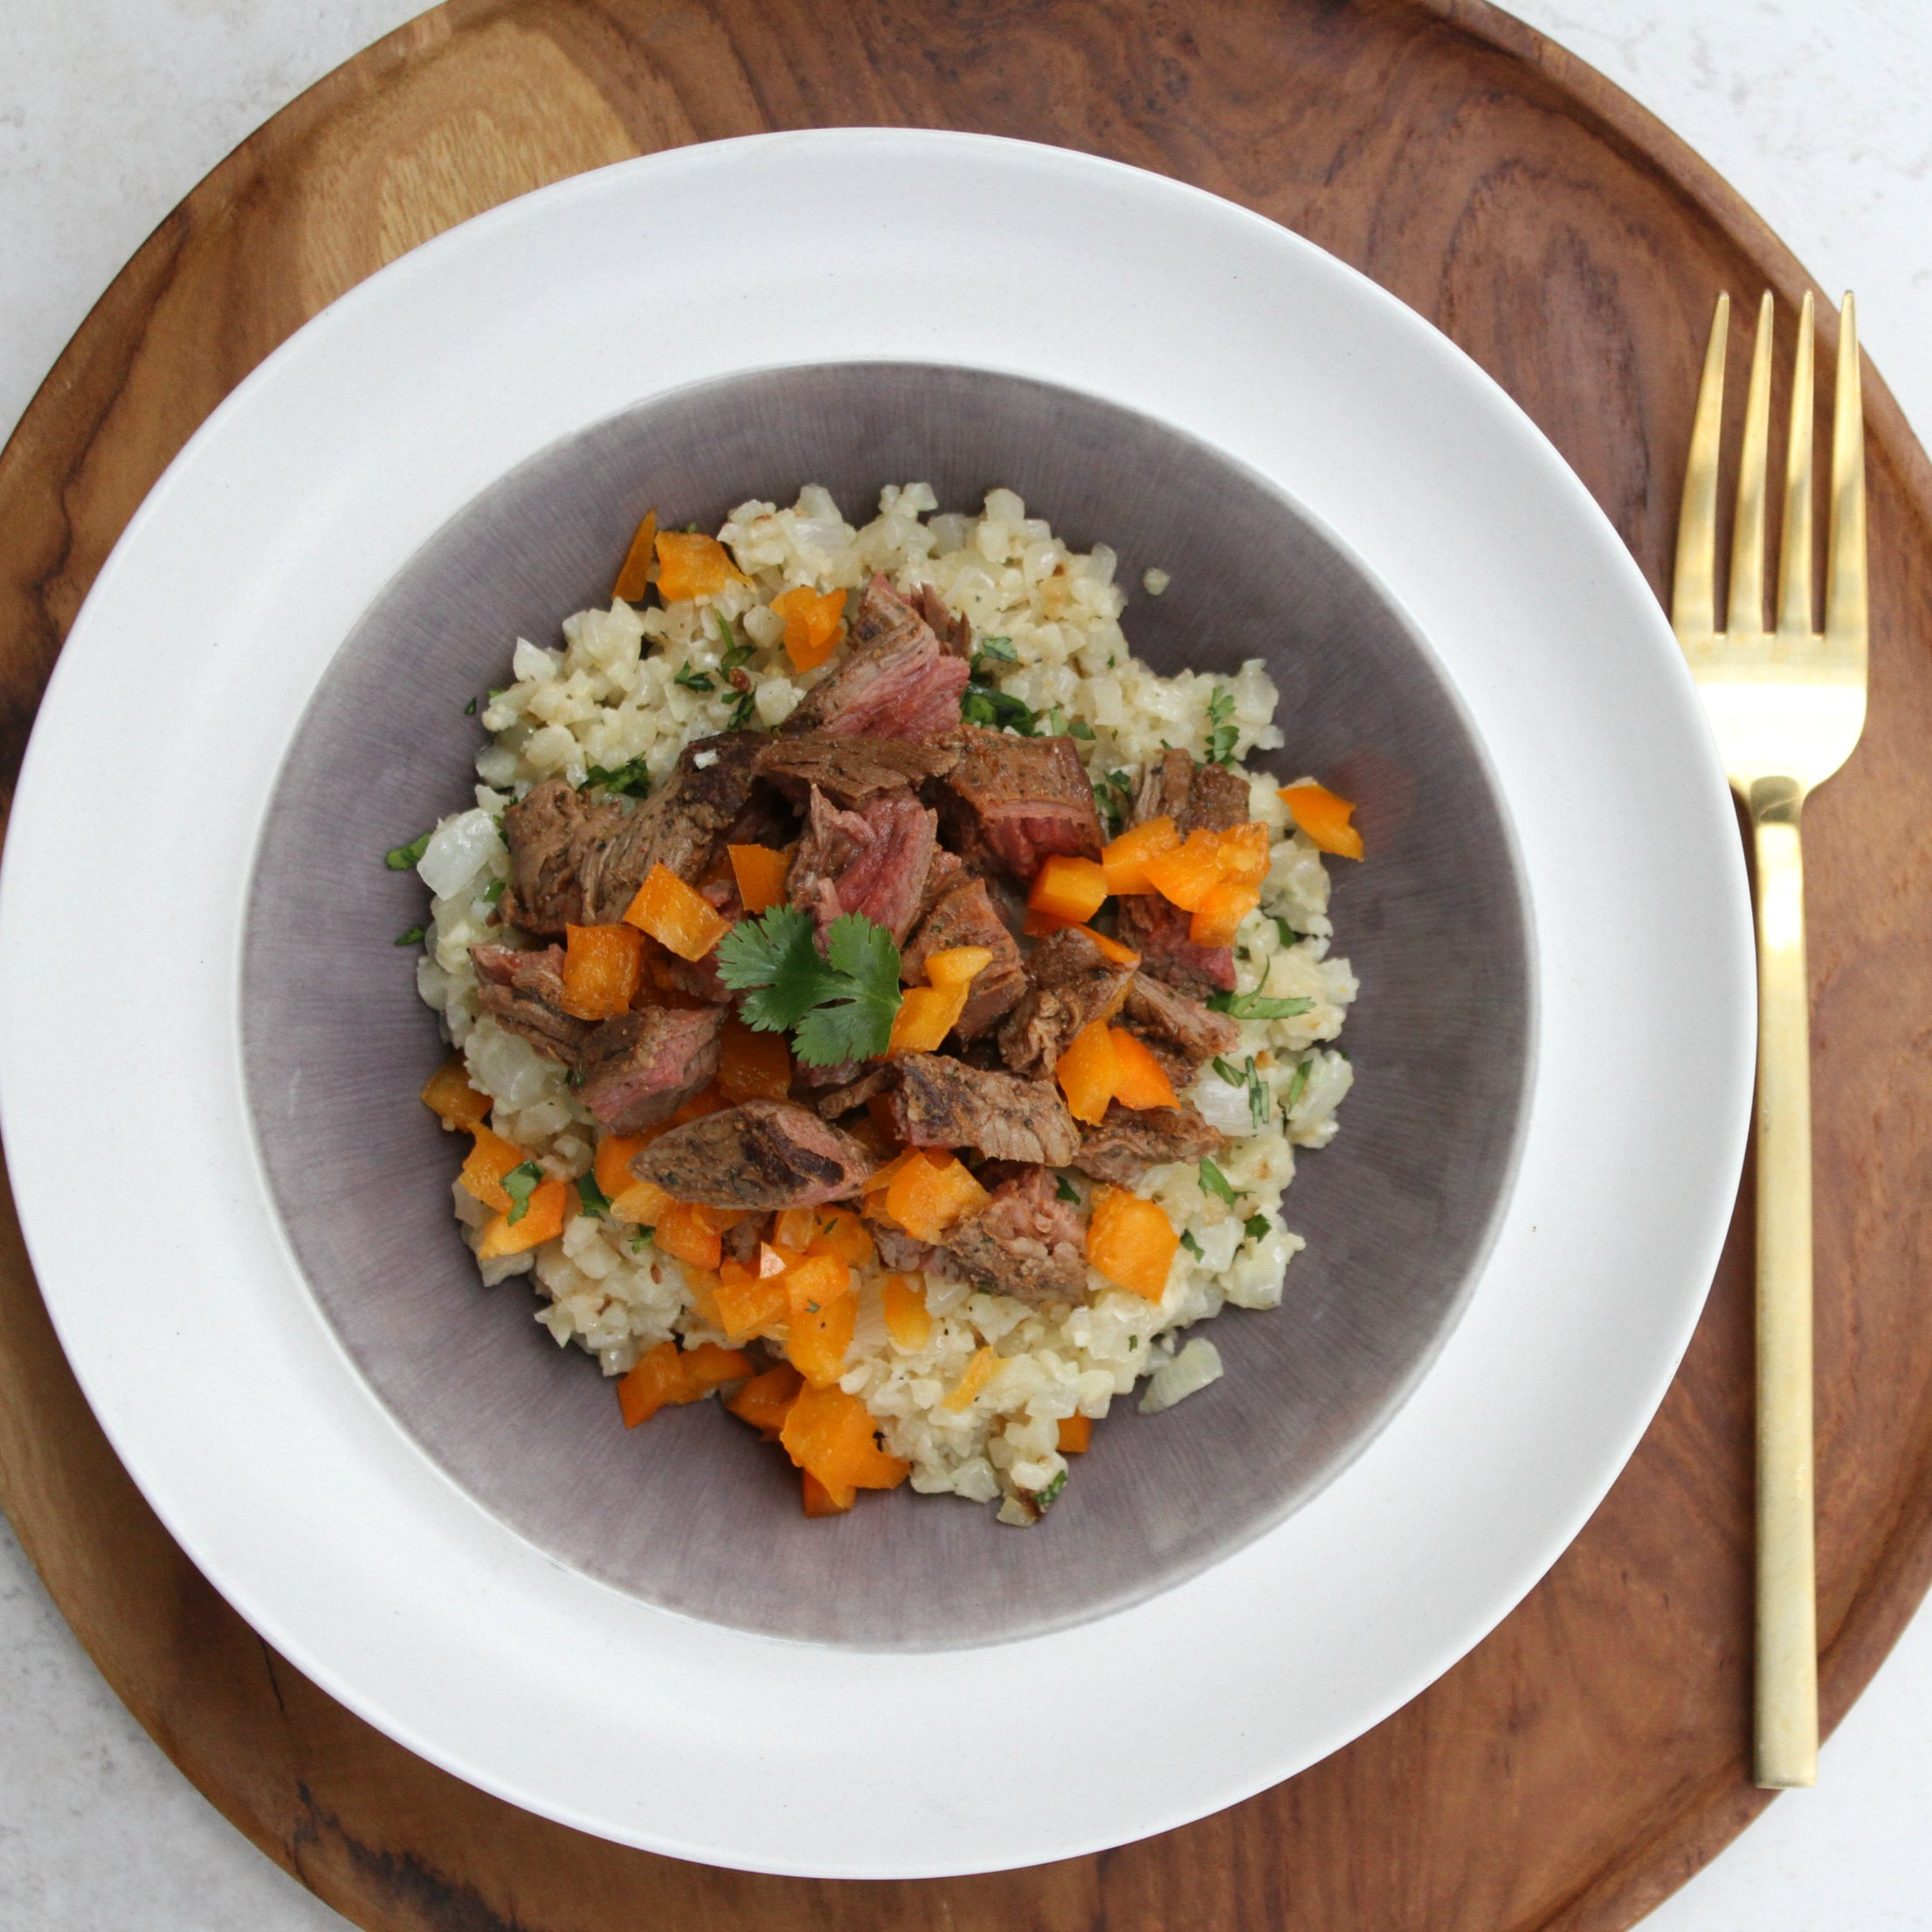 Pete's Paleo Meals, 3 Servings, Cauliflower Rice Dinners